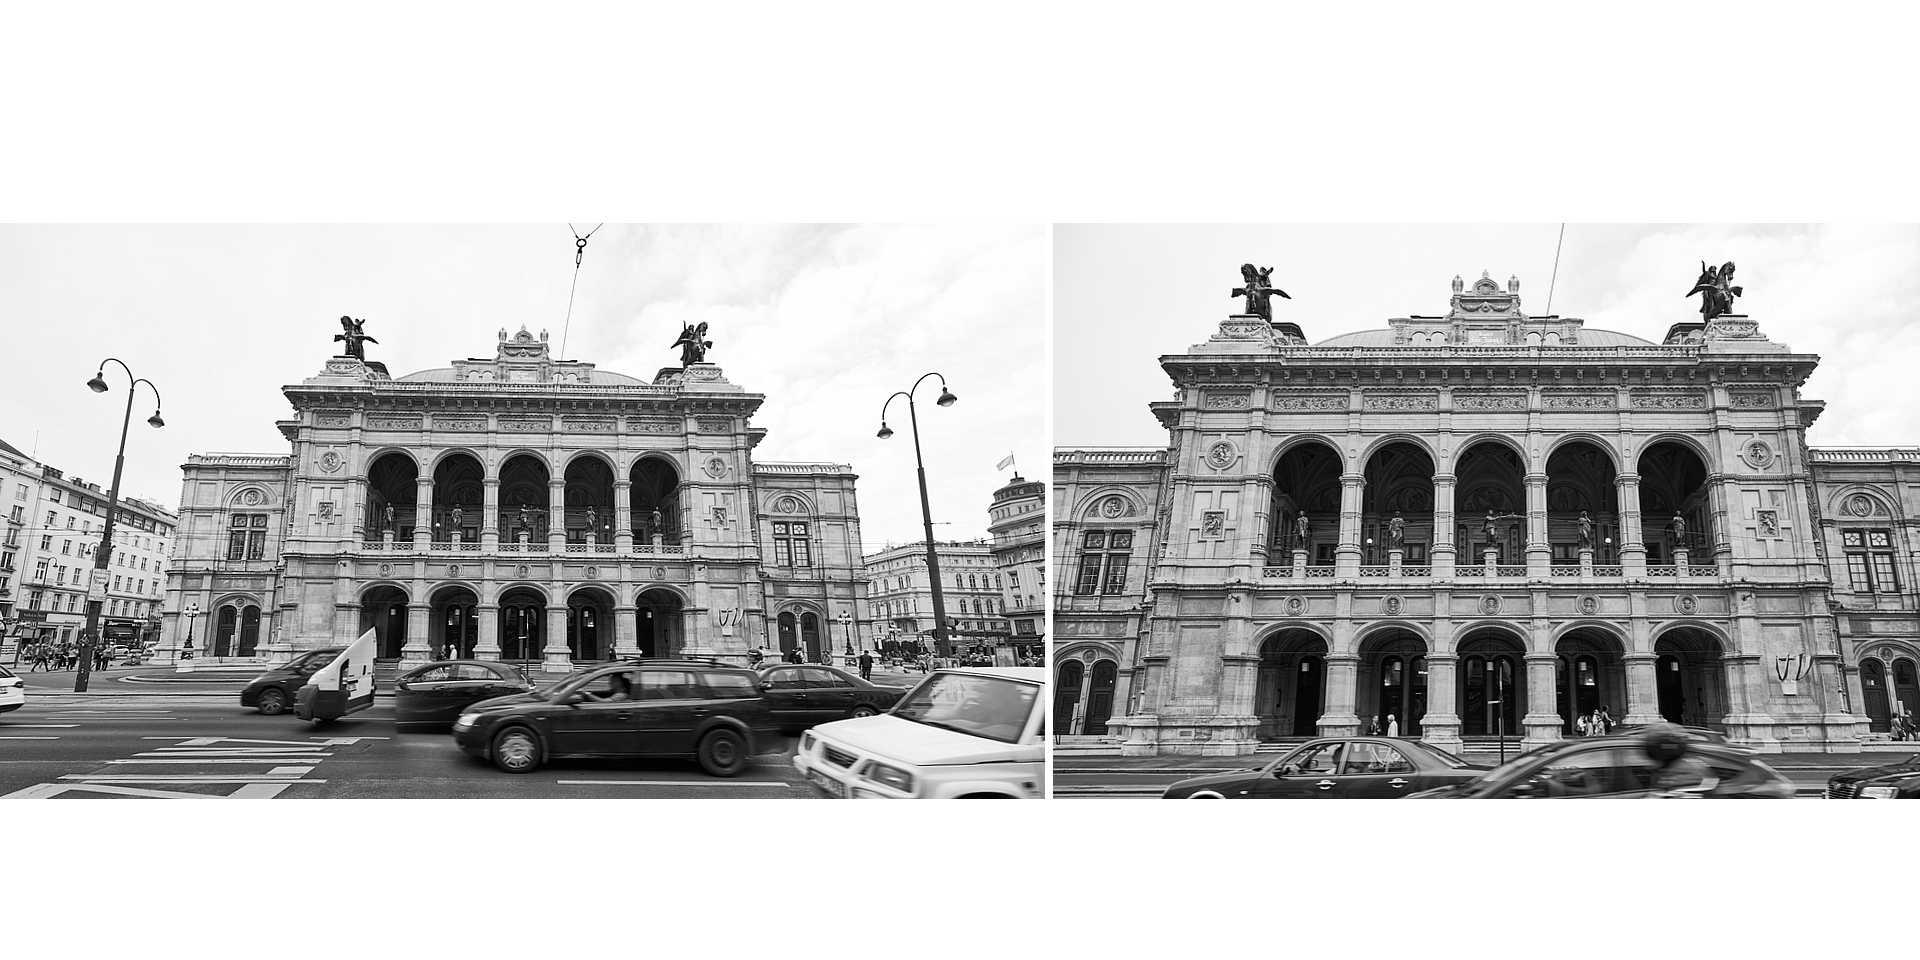 Live your Life - Descubre Viena - Ringstrasse - Ópera de Viena